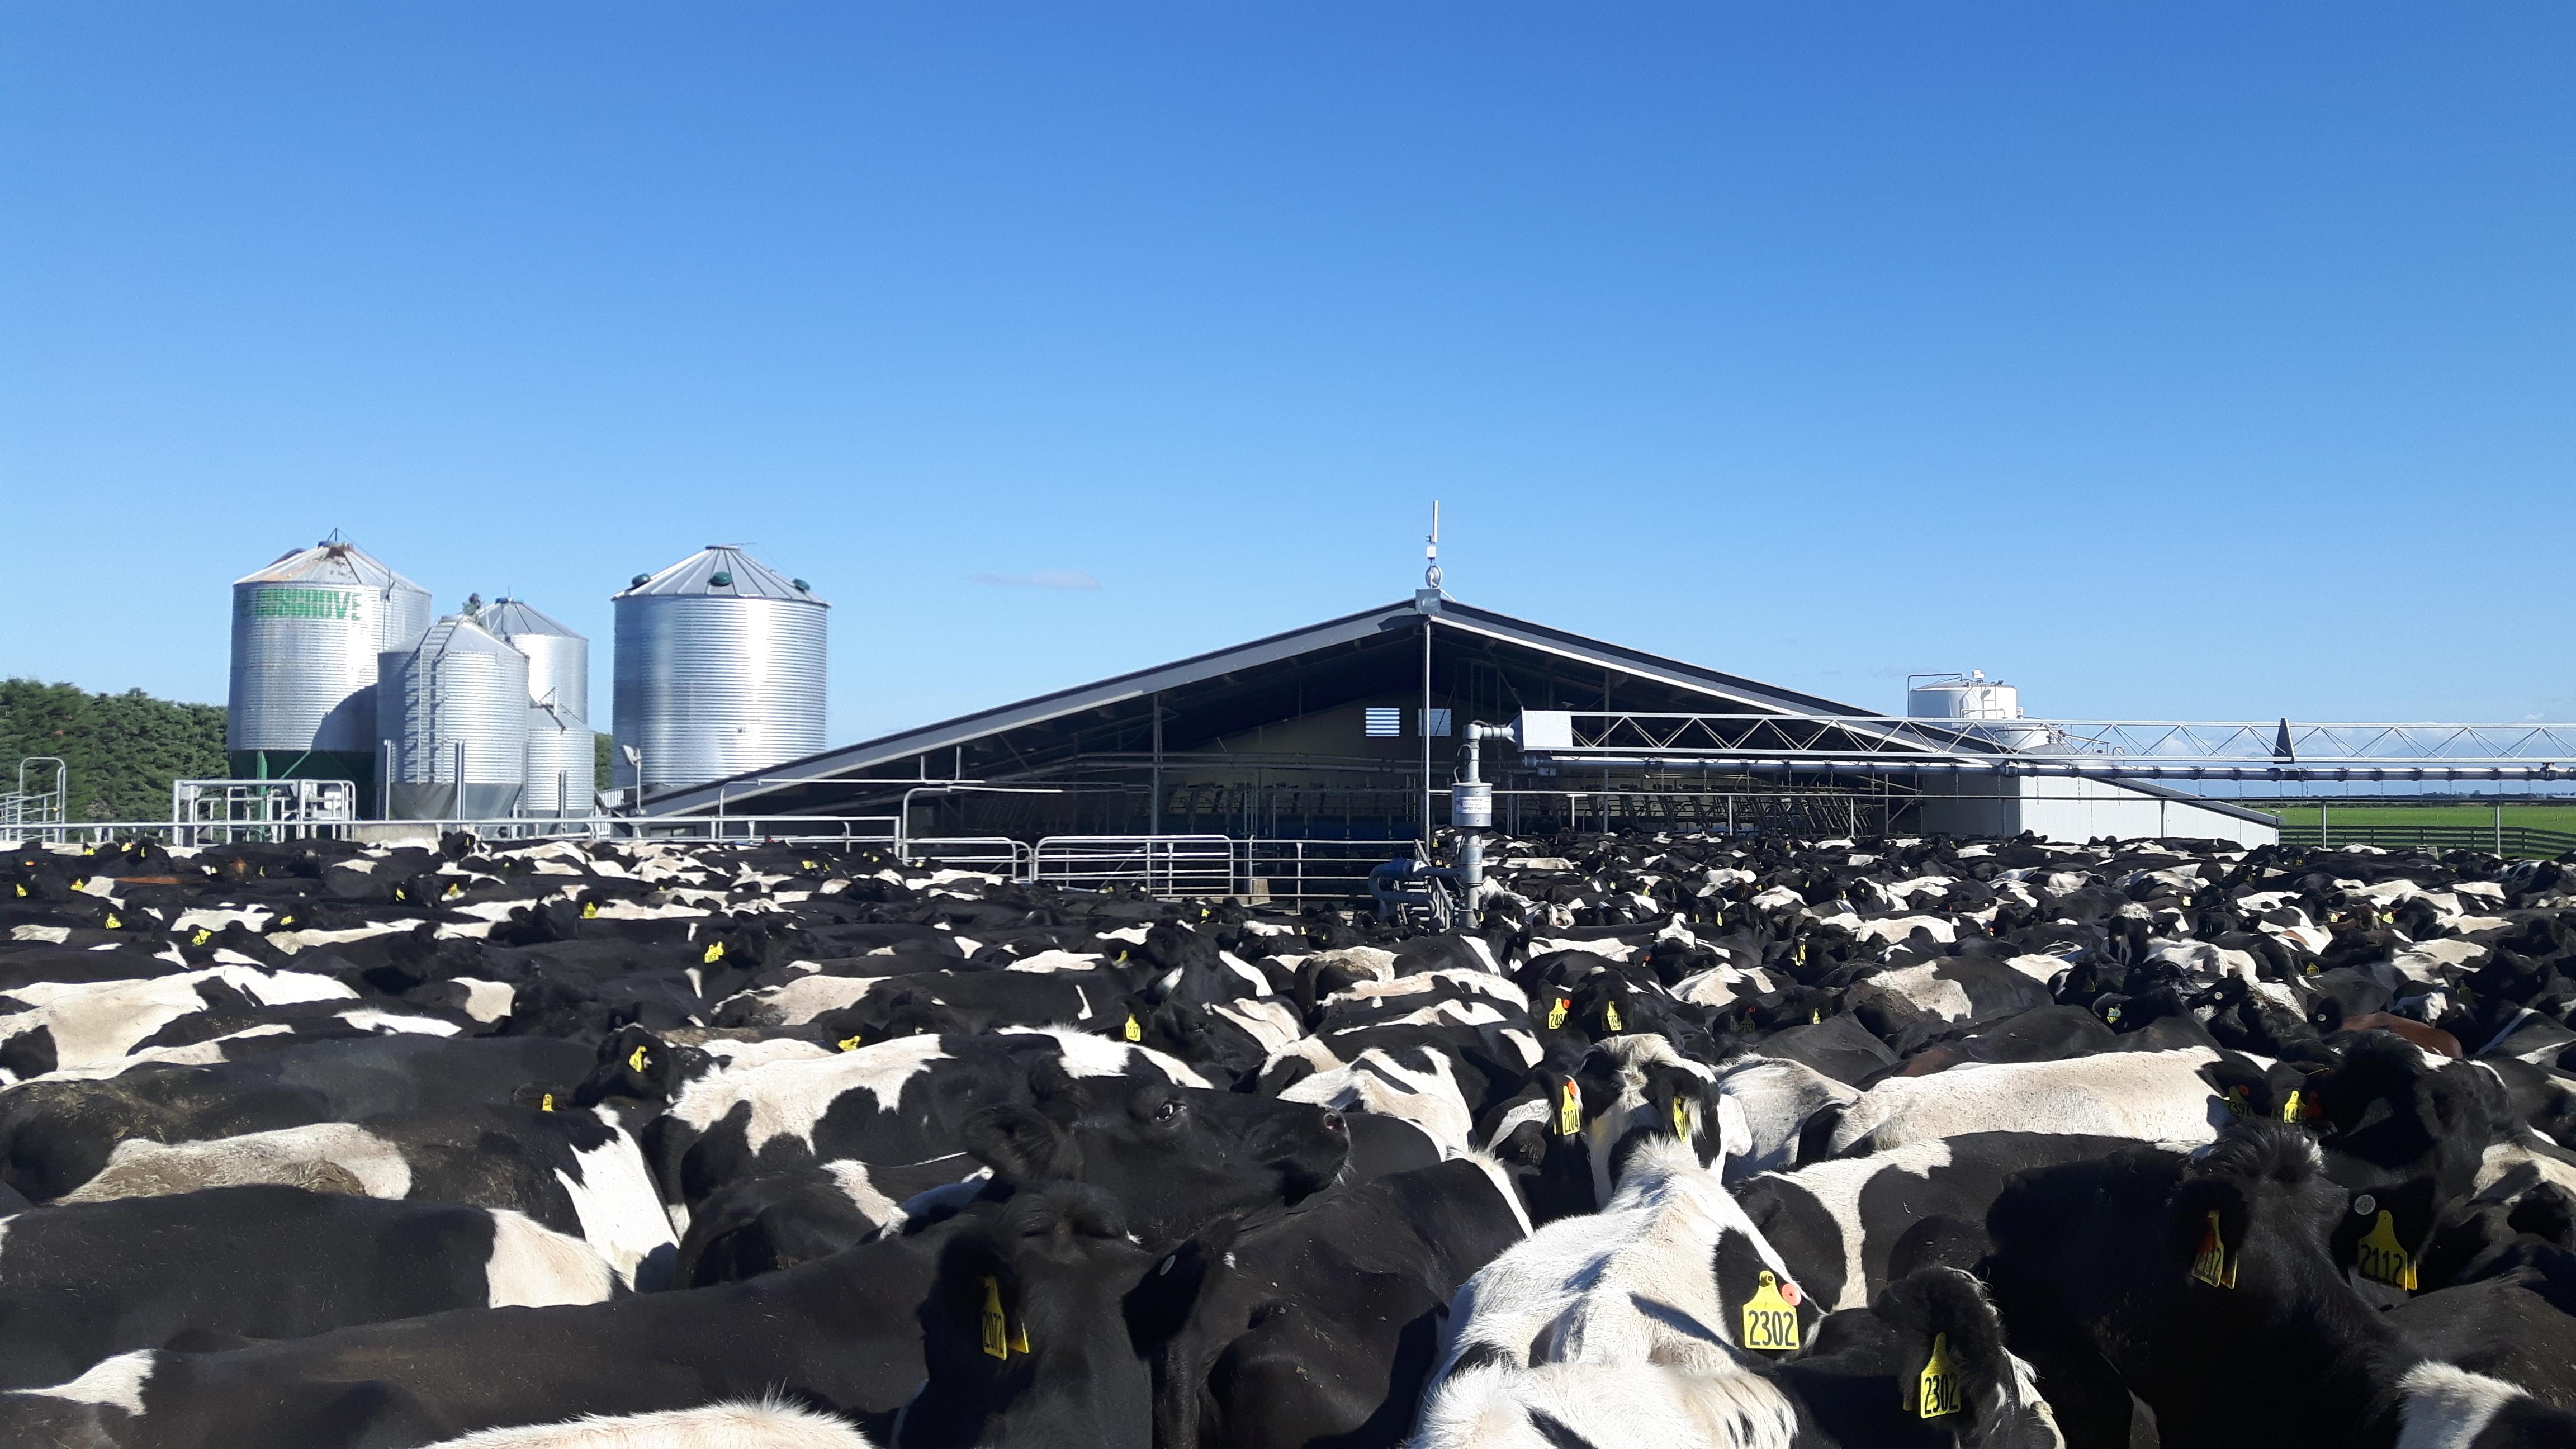 Kolmar Dairies